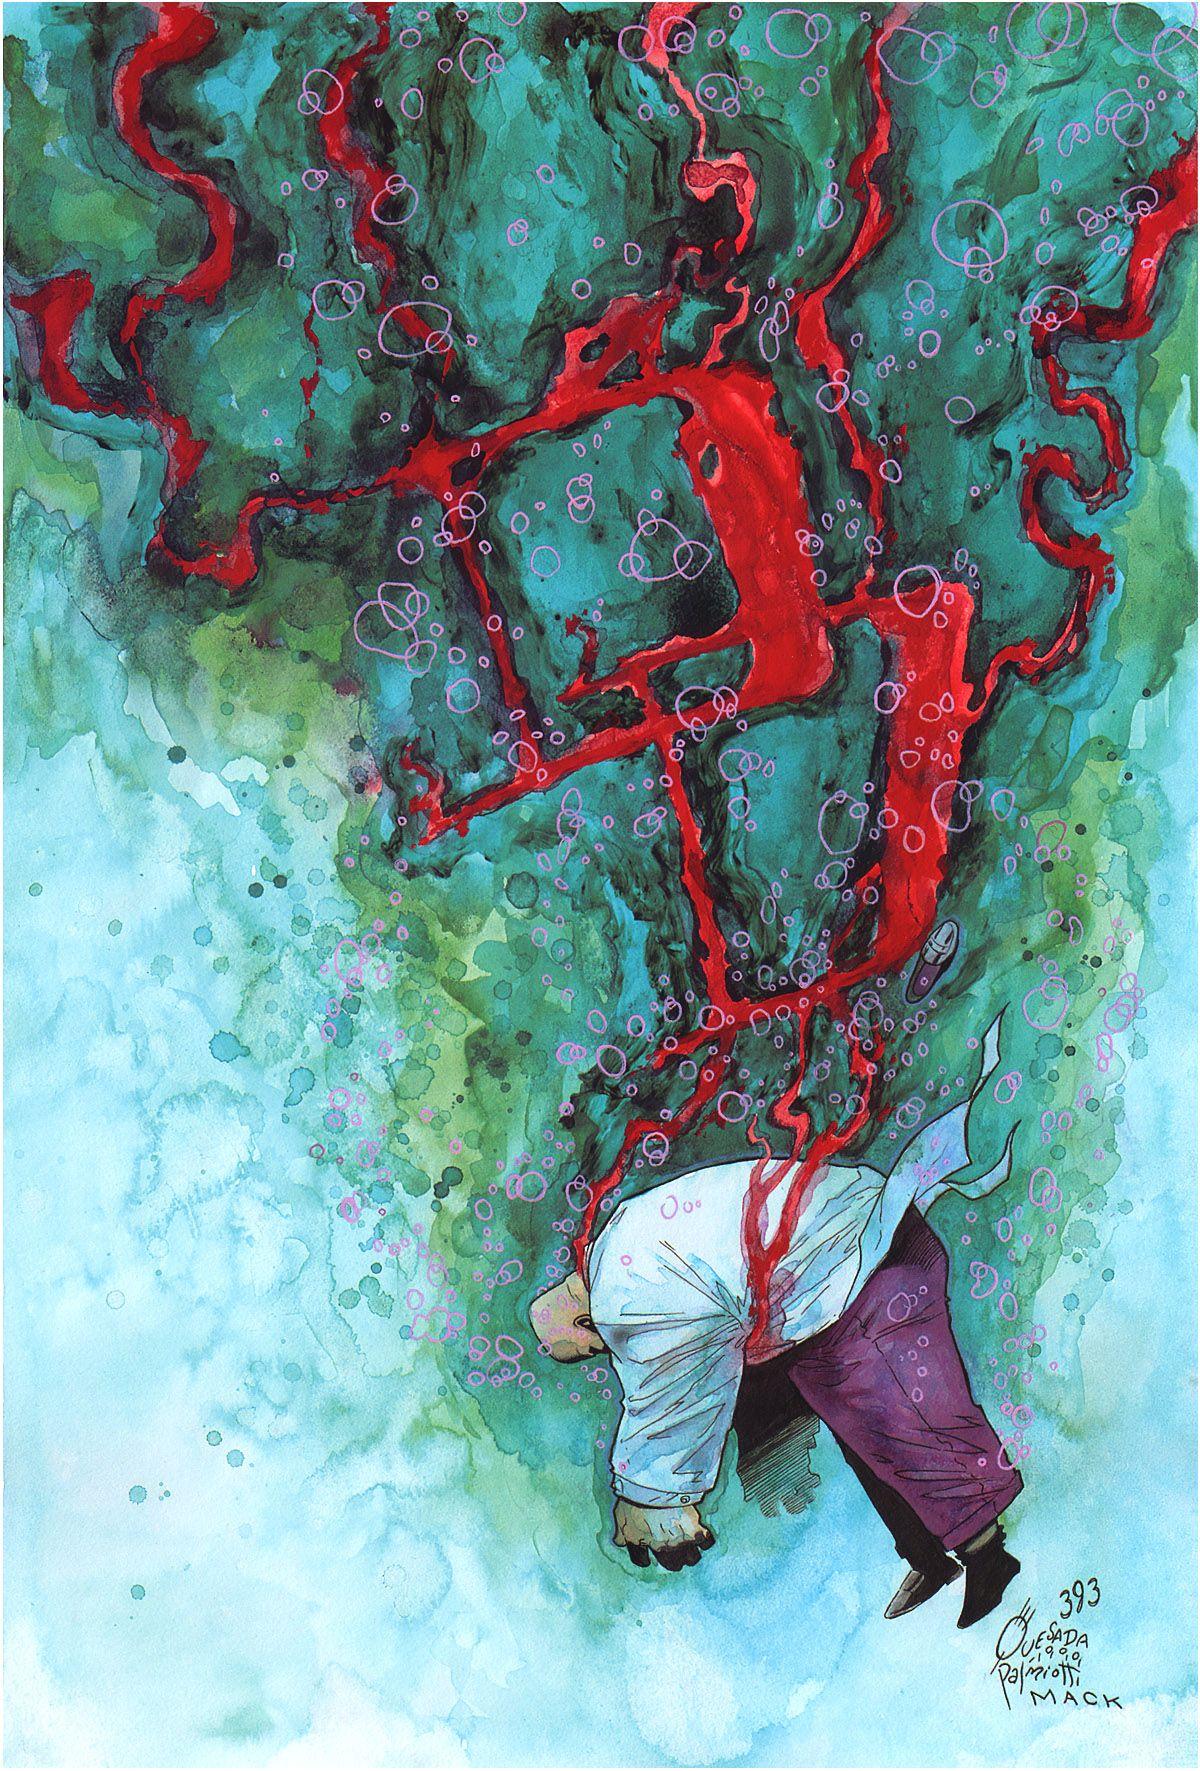 Daredevil cover by Joe Quesada & David Mack